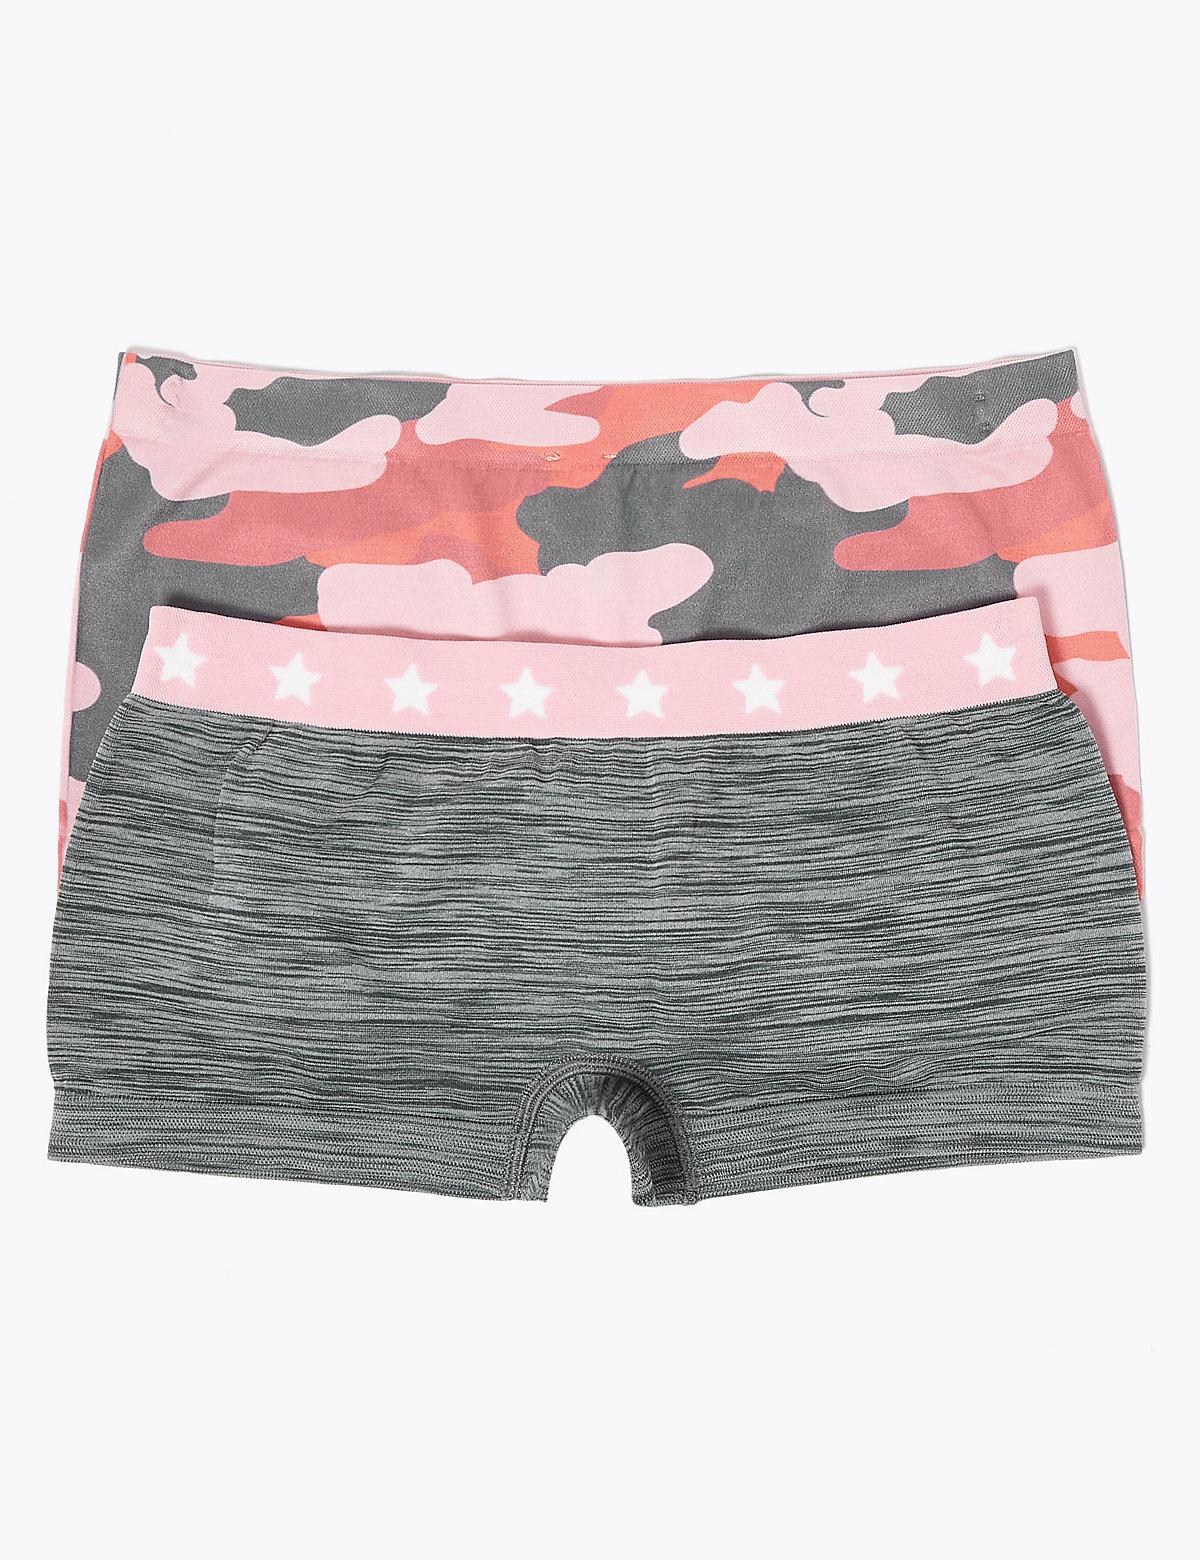 2 Pack Seamfree Camouflage Print Shorts (6-16 Yrs)